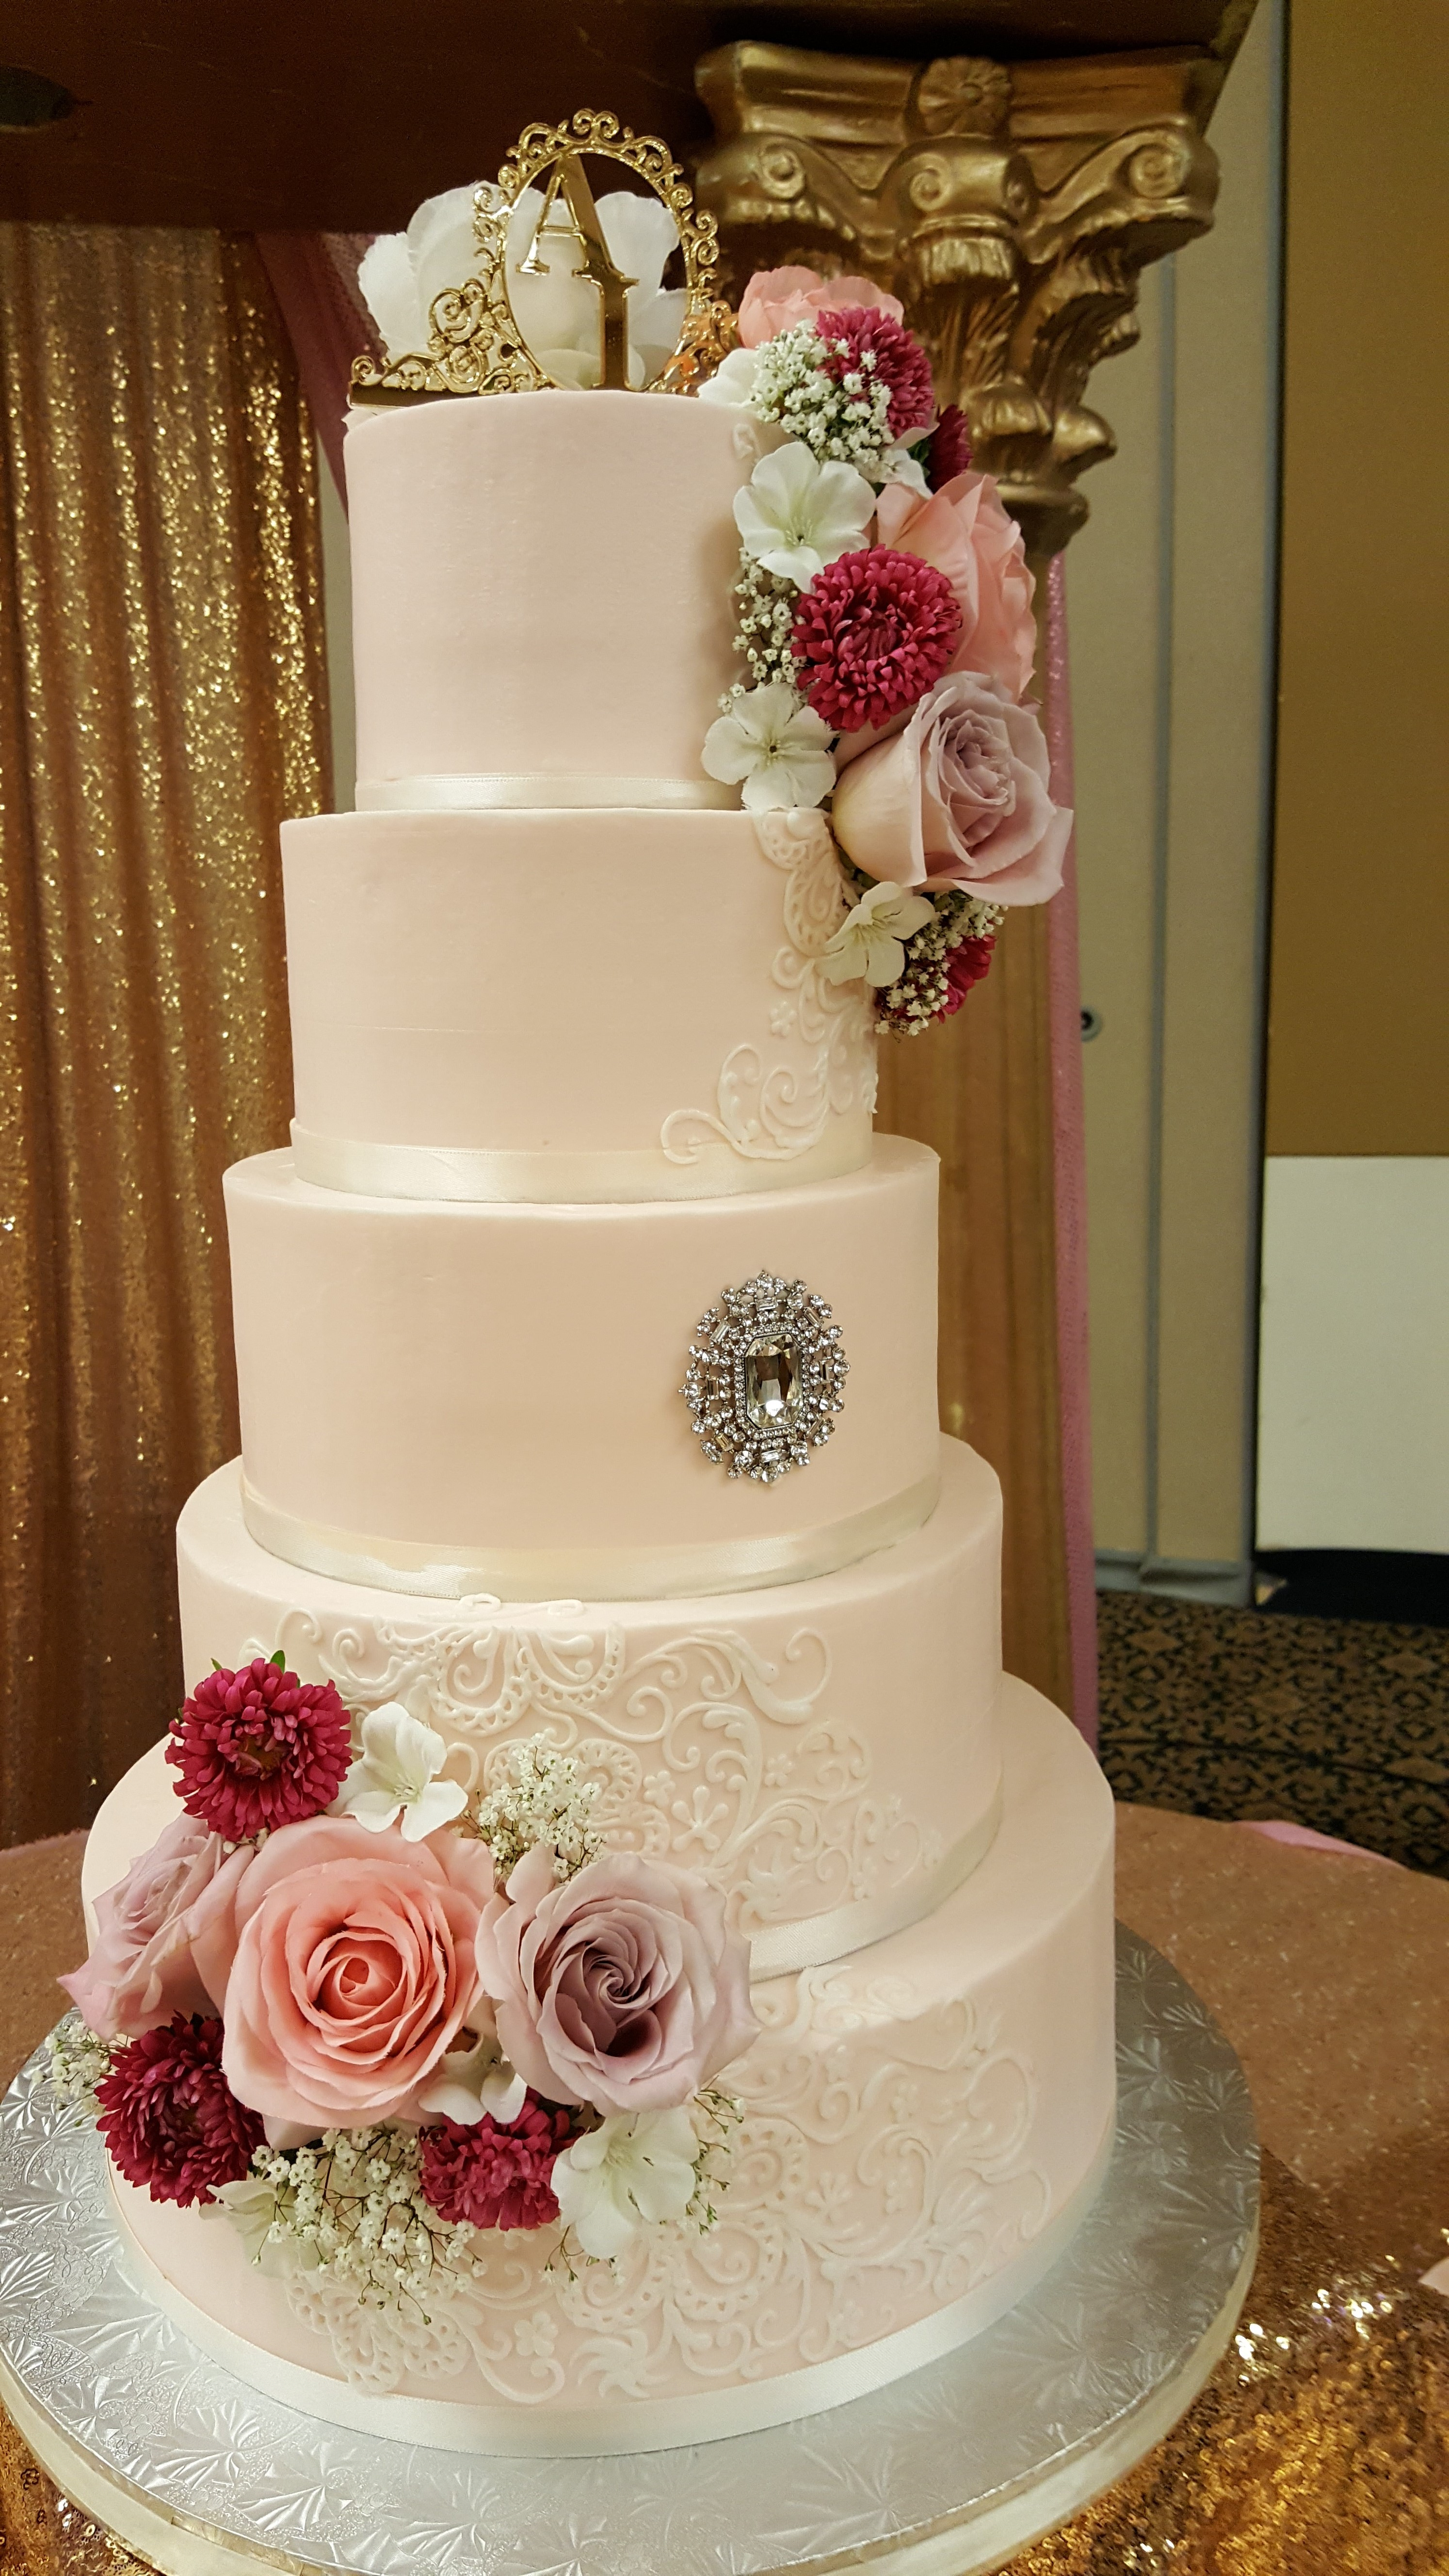 Wedding Cakes by Tammy Allen image 18